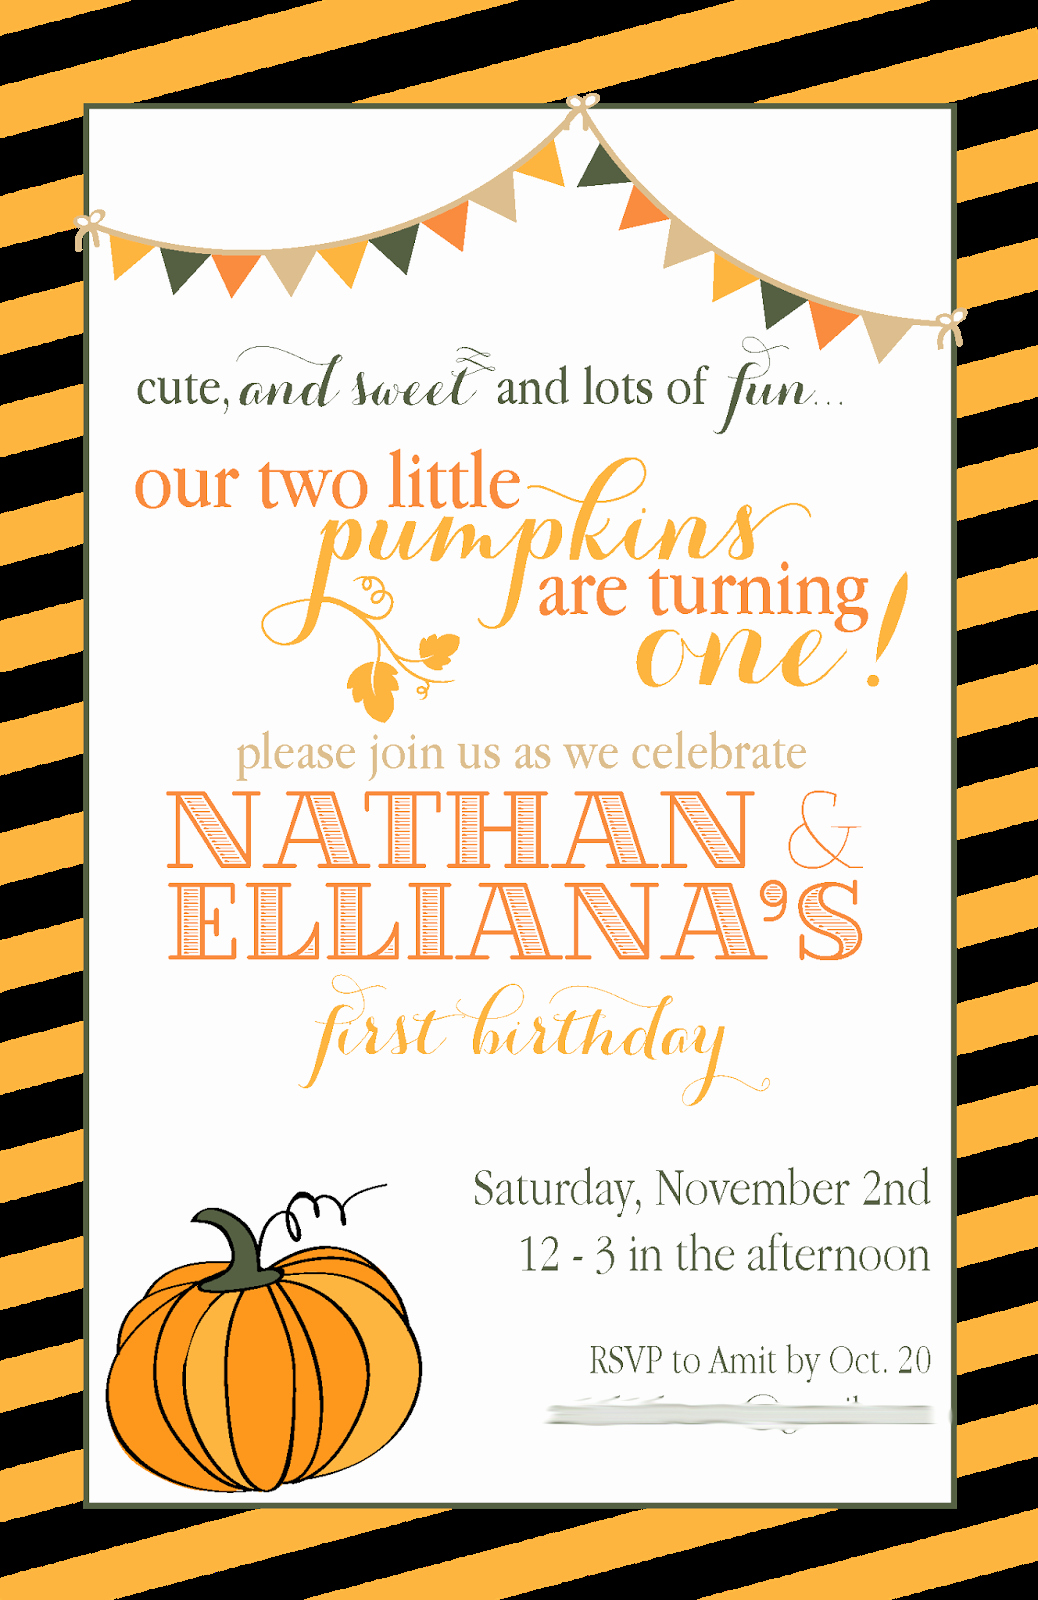 Fall Party Invitation Template Beautiful Aliya Rinaldi Designs Invitations Logos & Graphic Design